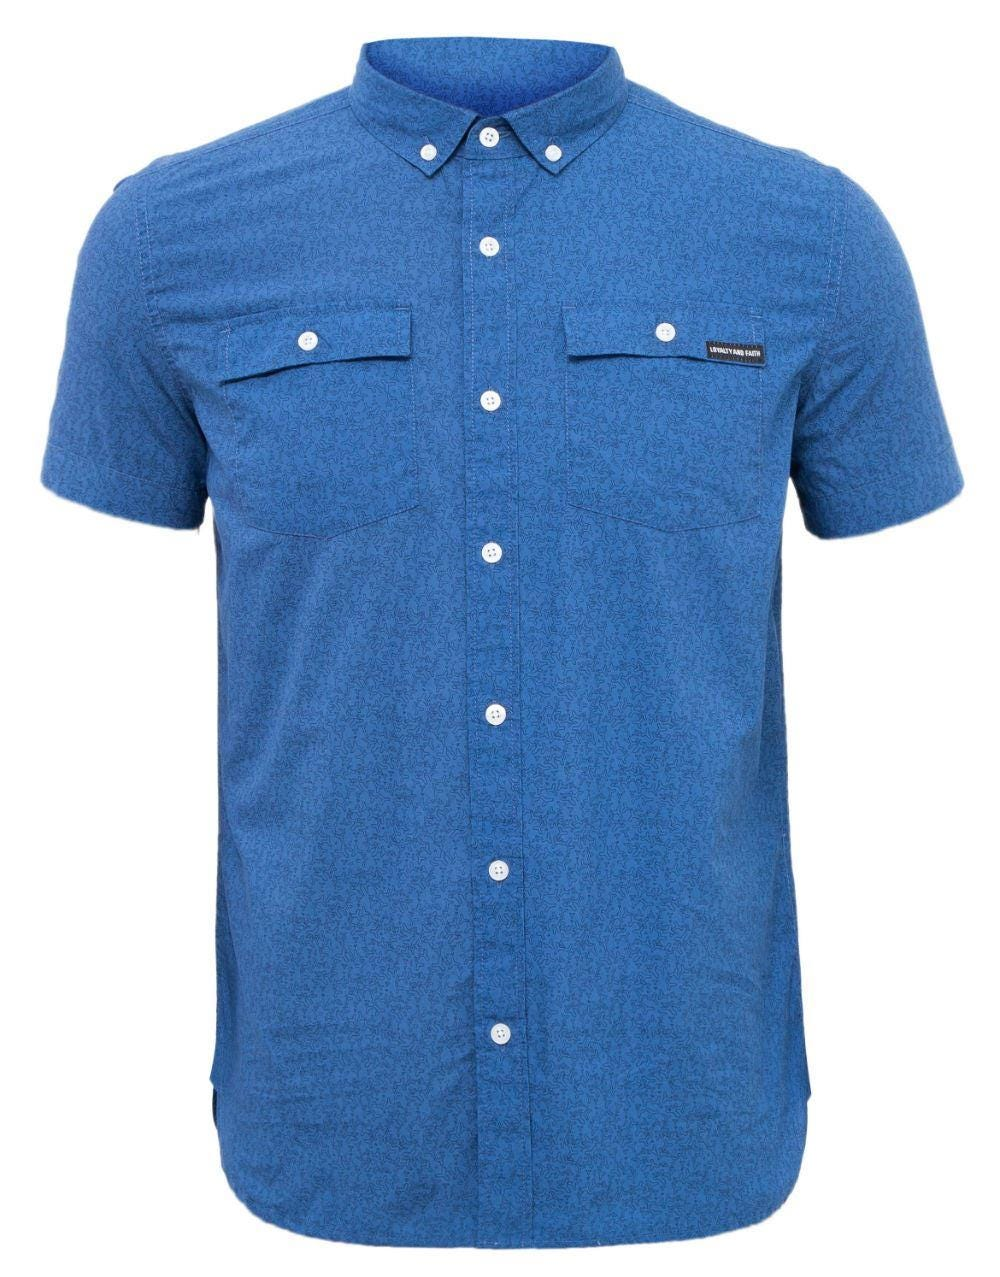 Loyalty & Faith Bronte Shirt - Blue|4XL